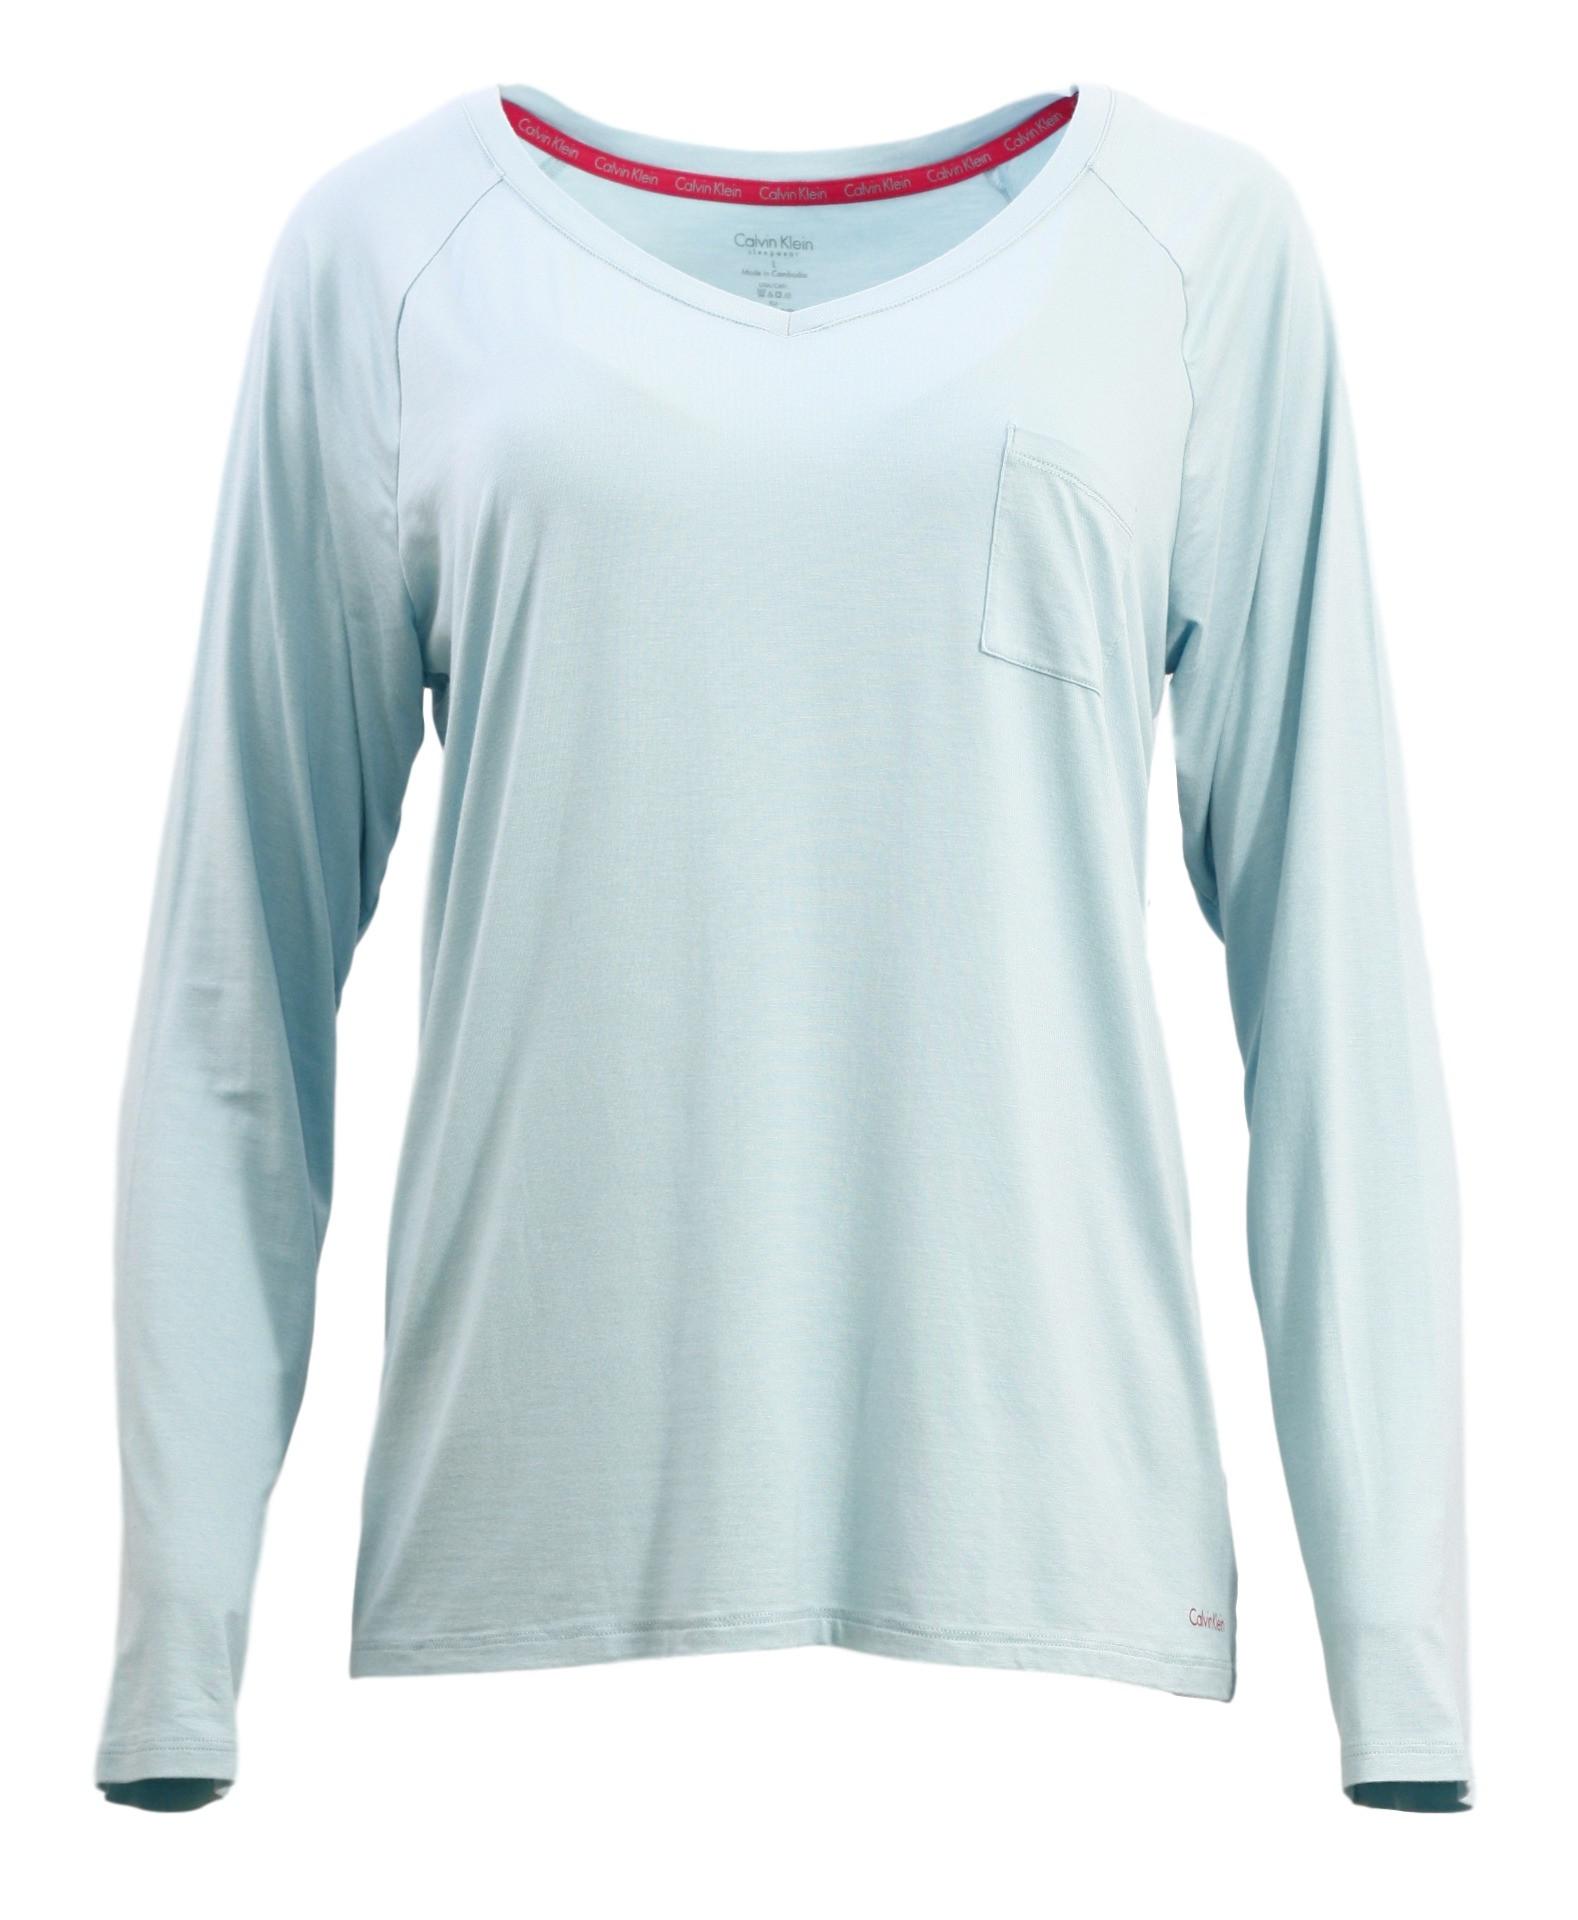 e4da016f1d3c Dámské tričko na spaní QS5322E - Calvin Klein - Modrozelená L empty